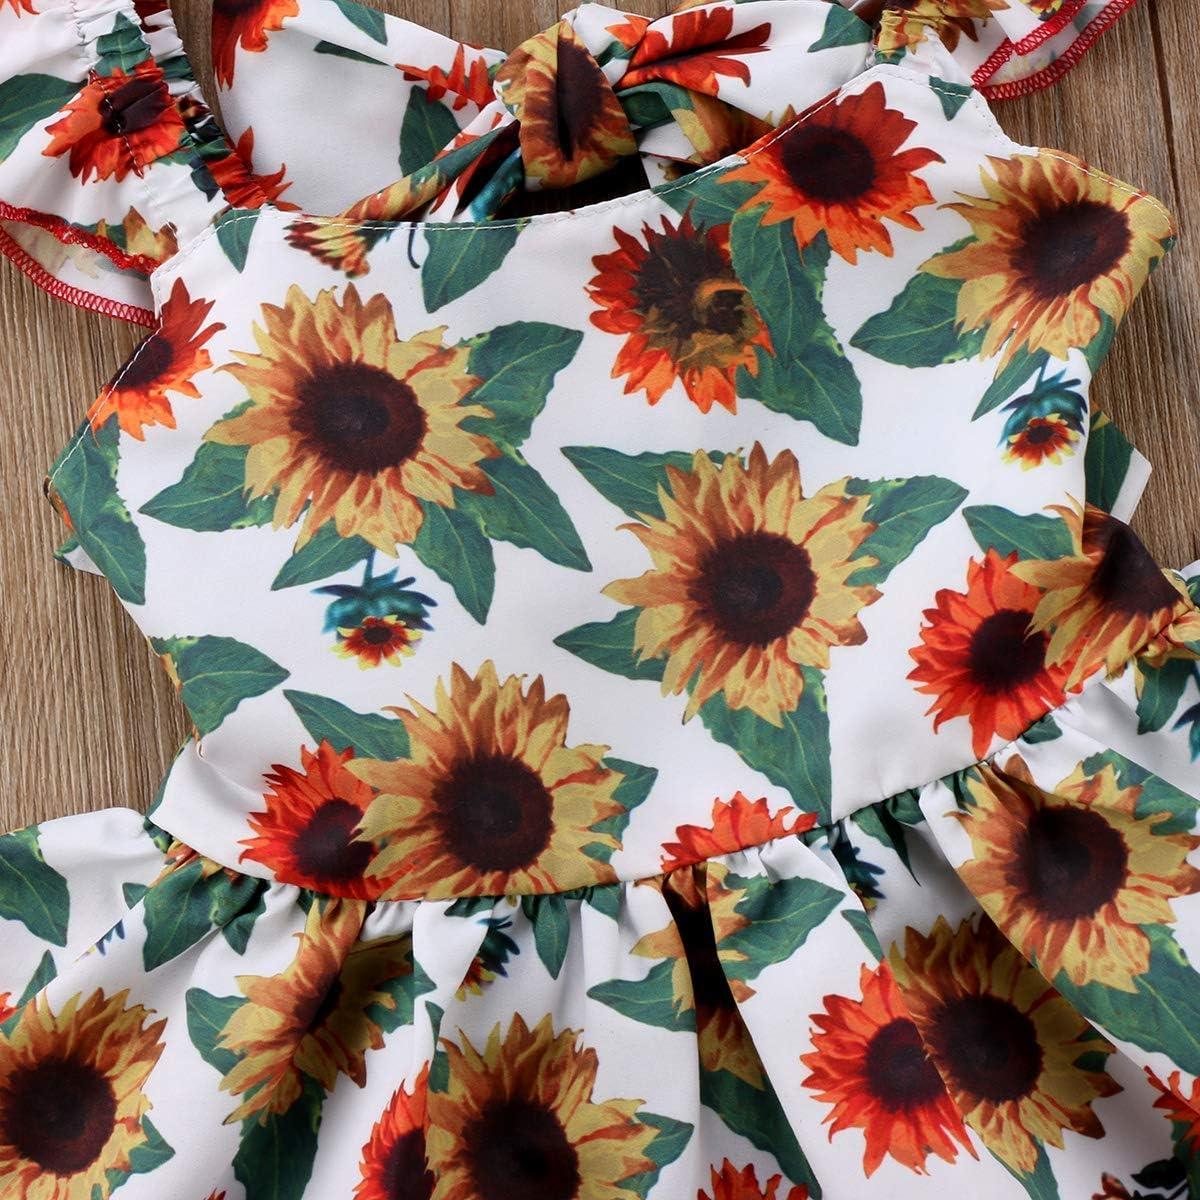 Newborn Kids Baby Girls Outfits Clothes Sunflower Floral Top Dress+Bottoms 2pcs Set 0-24M